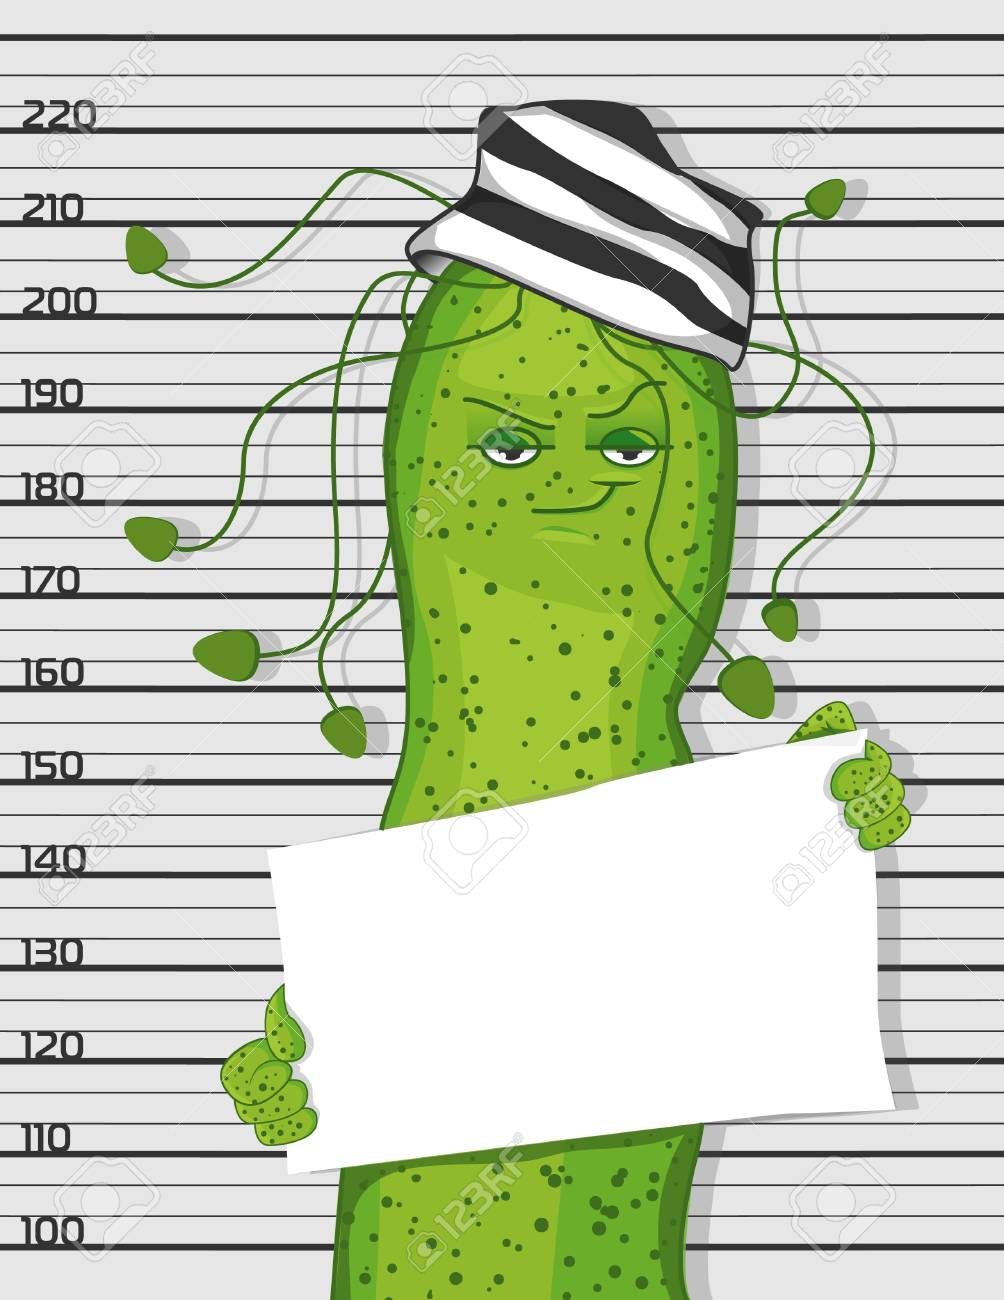 Bacterium Helicobacter pylori in the image of a criminal. Cartoon bacterium. - 95519120